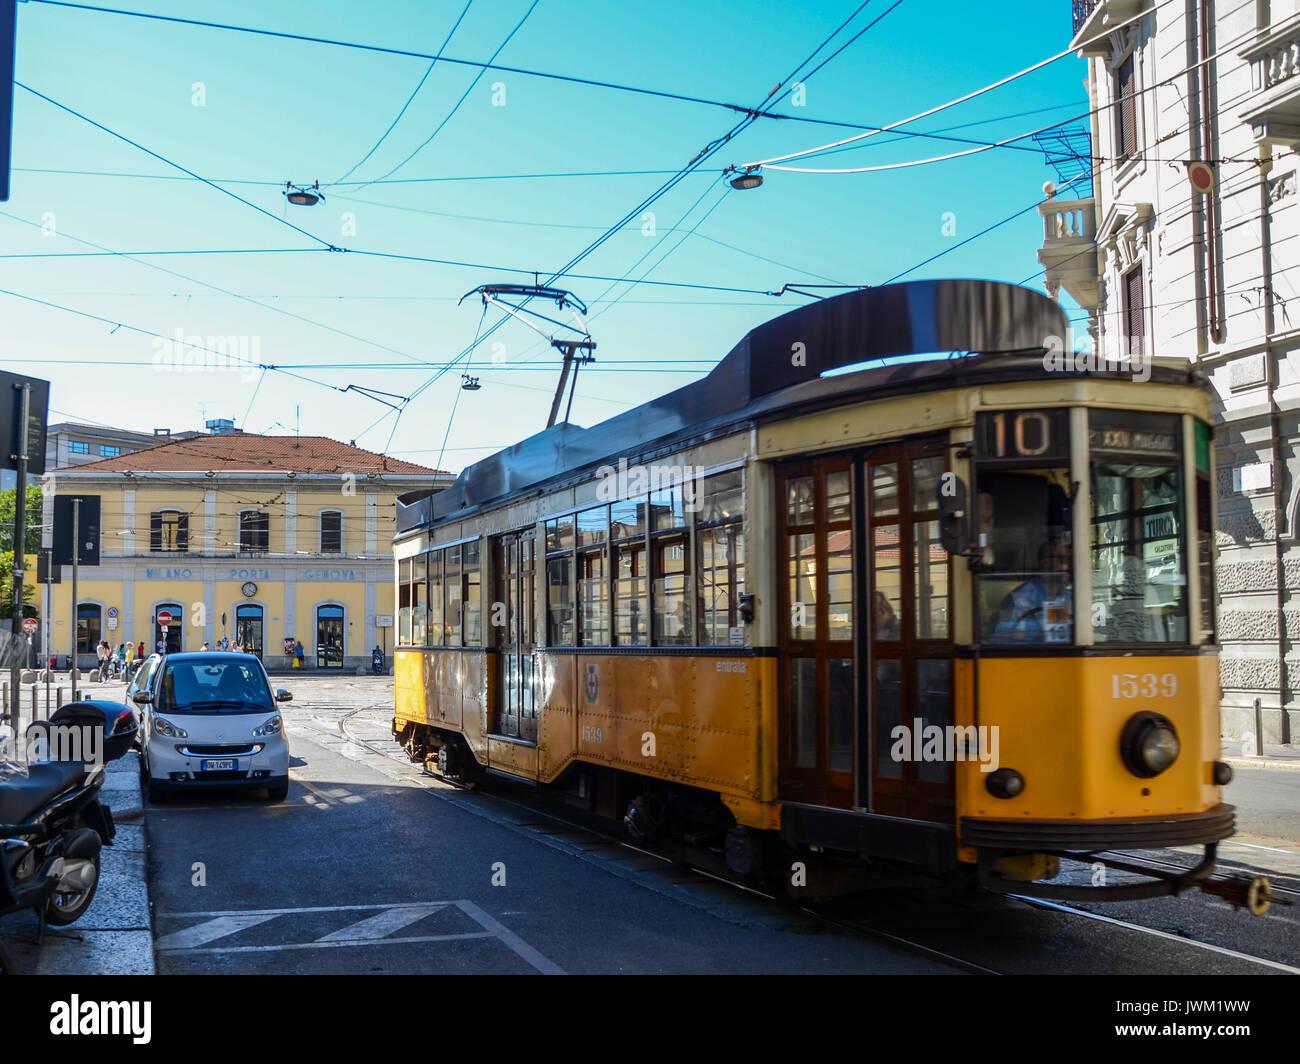 A traditional 1930s tram in Milan, Italy taken at Bohemian Navigli district passing Porta Genova station - Stock Image